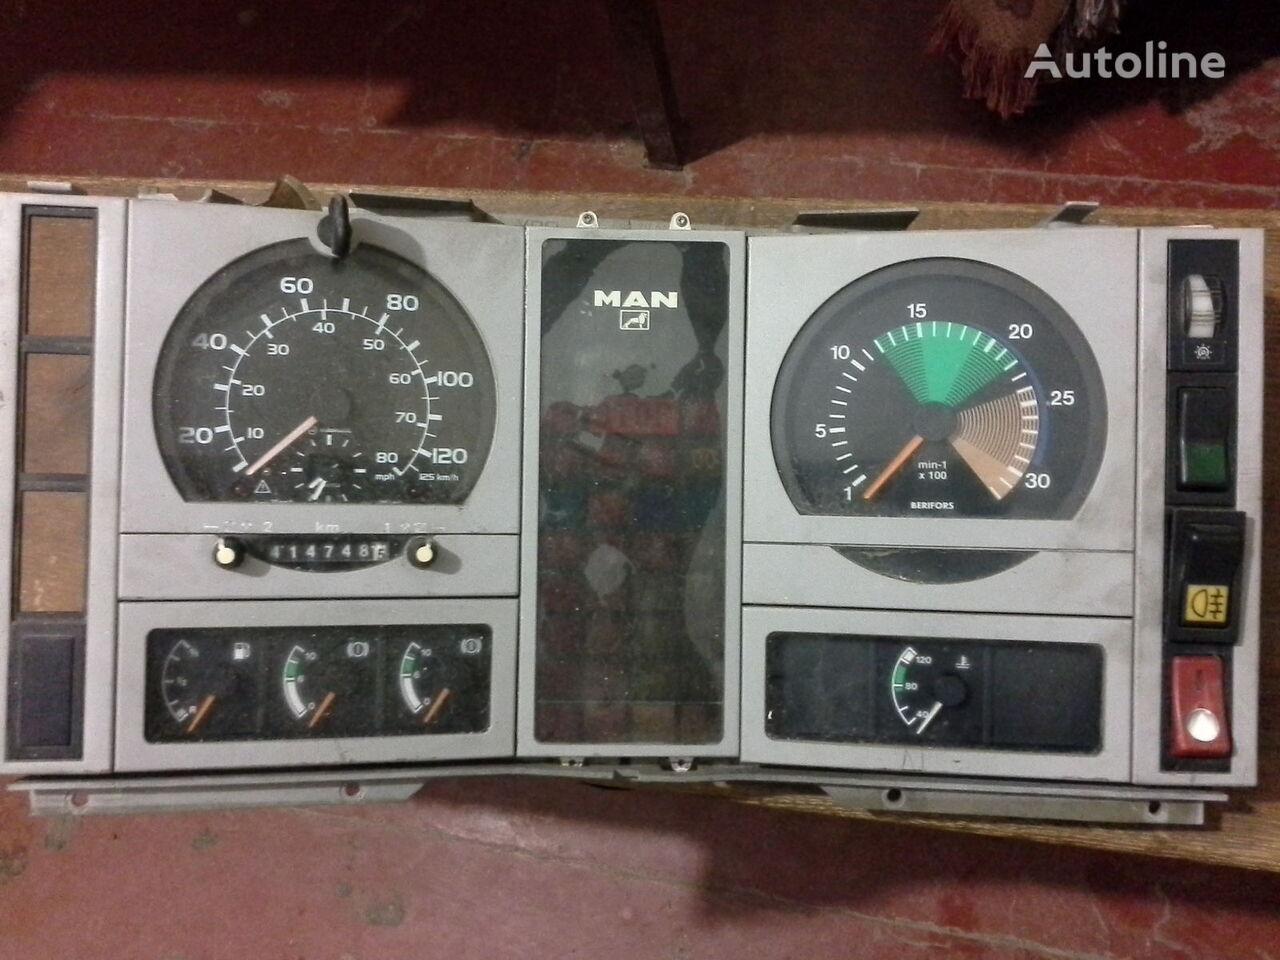 MAN Spidometr Tahometr originalni zapchasti kabini tachograph for MAN  L2000 Po zapchastyam truck